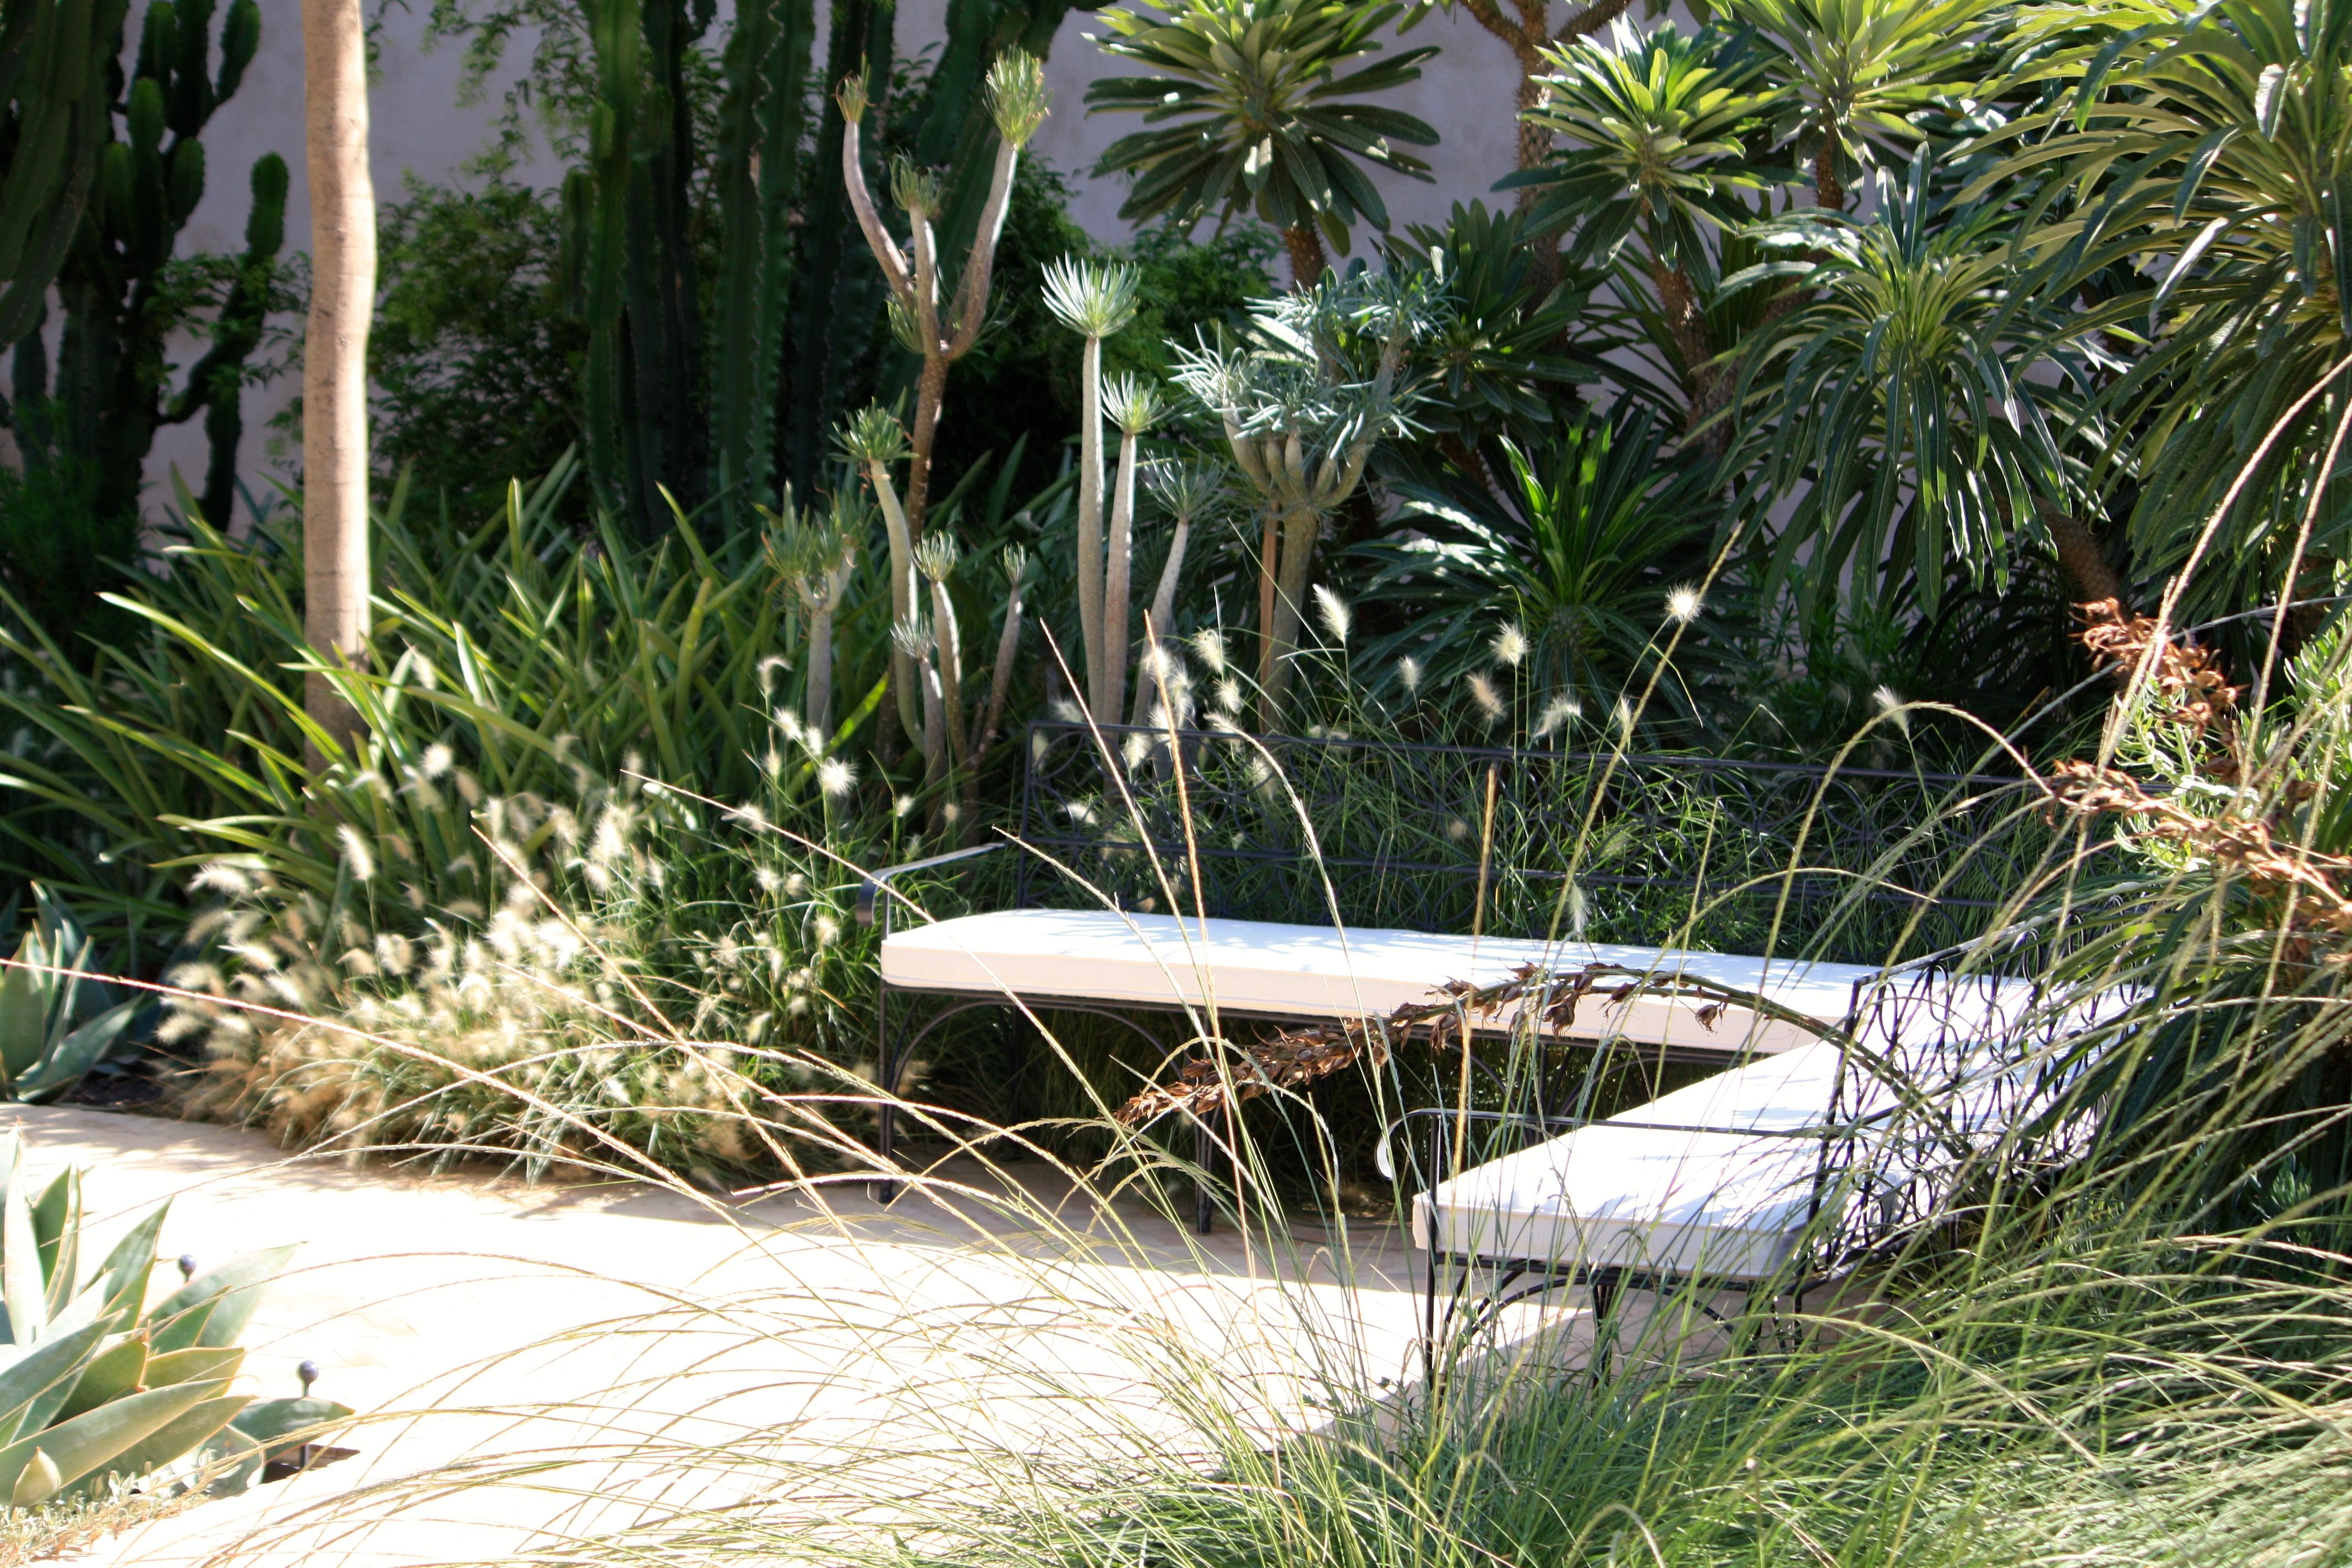 Tropical Gardens – The Frustrated Gardener